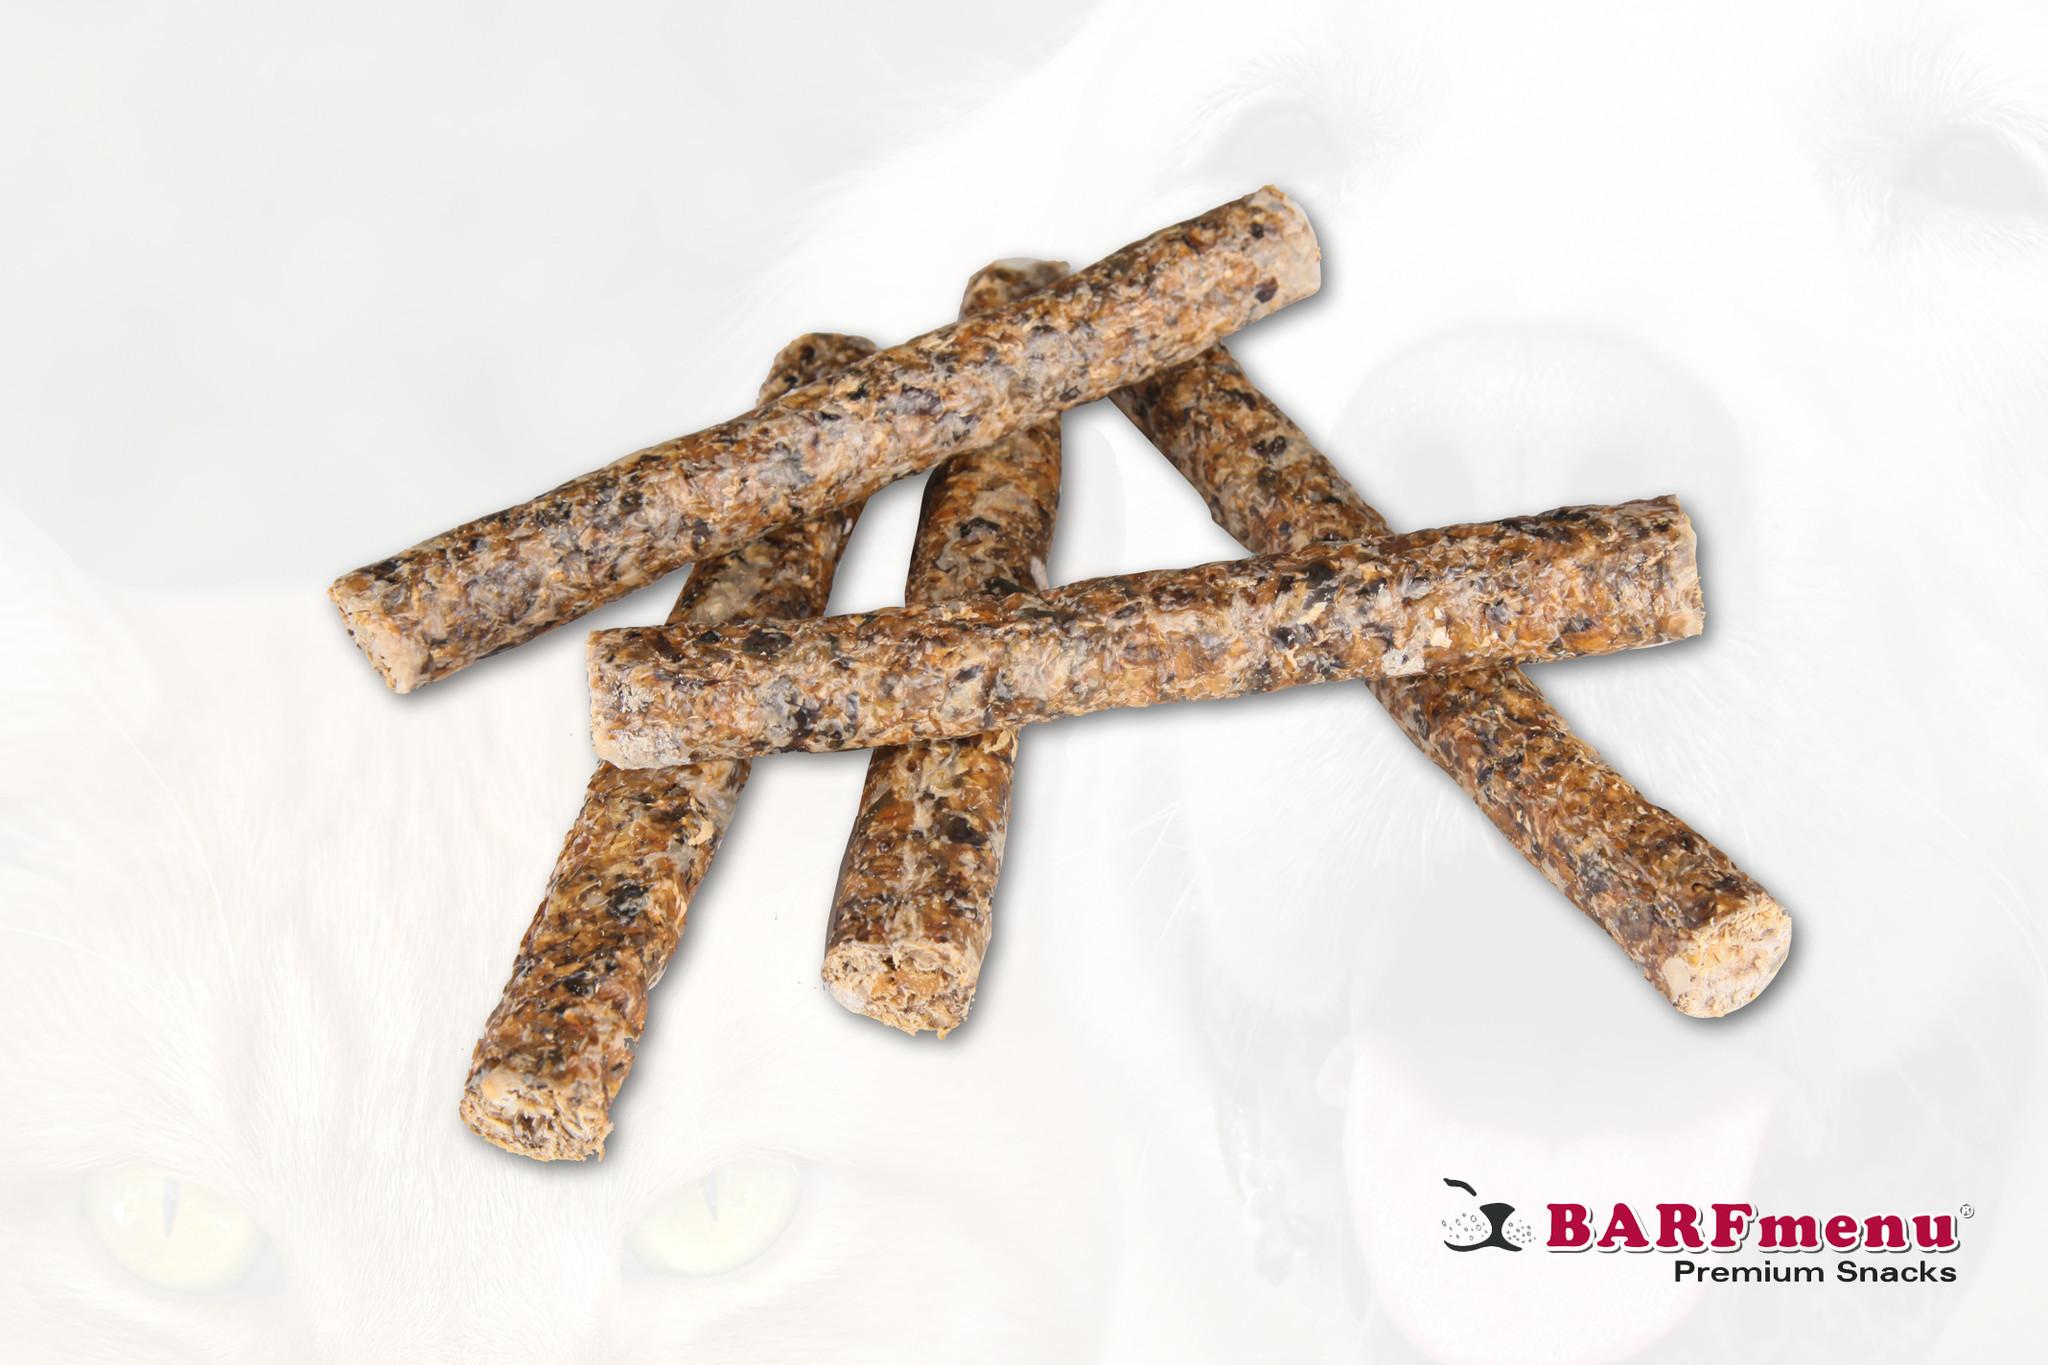 BARFmenu Premium Snack Kabeljauwsticks MSC